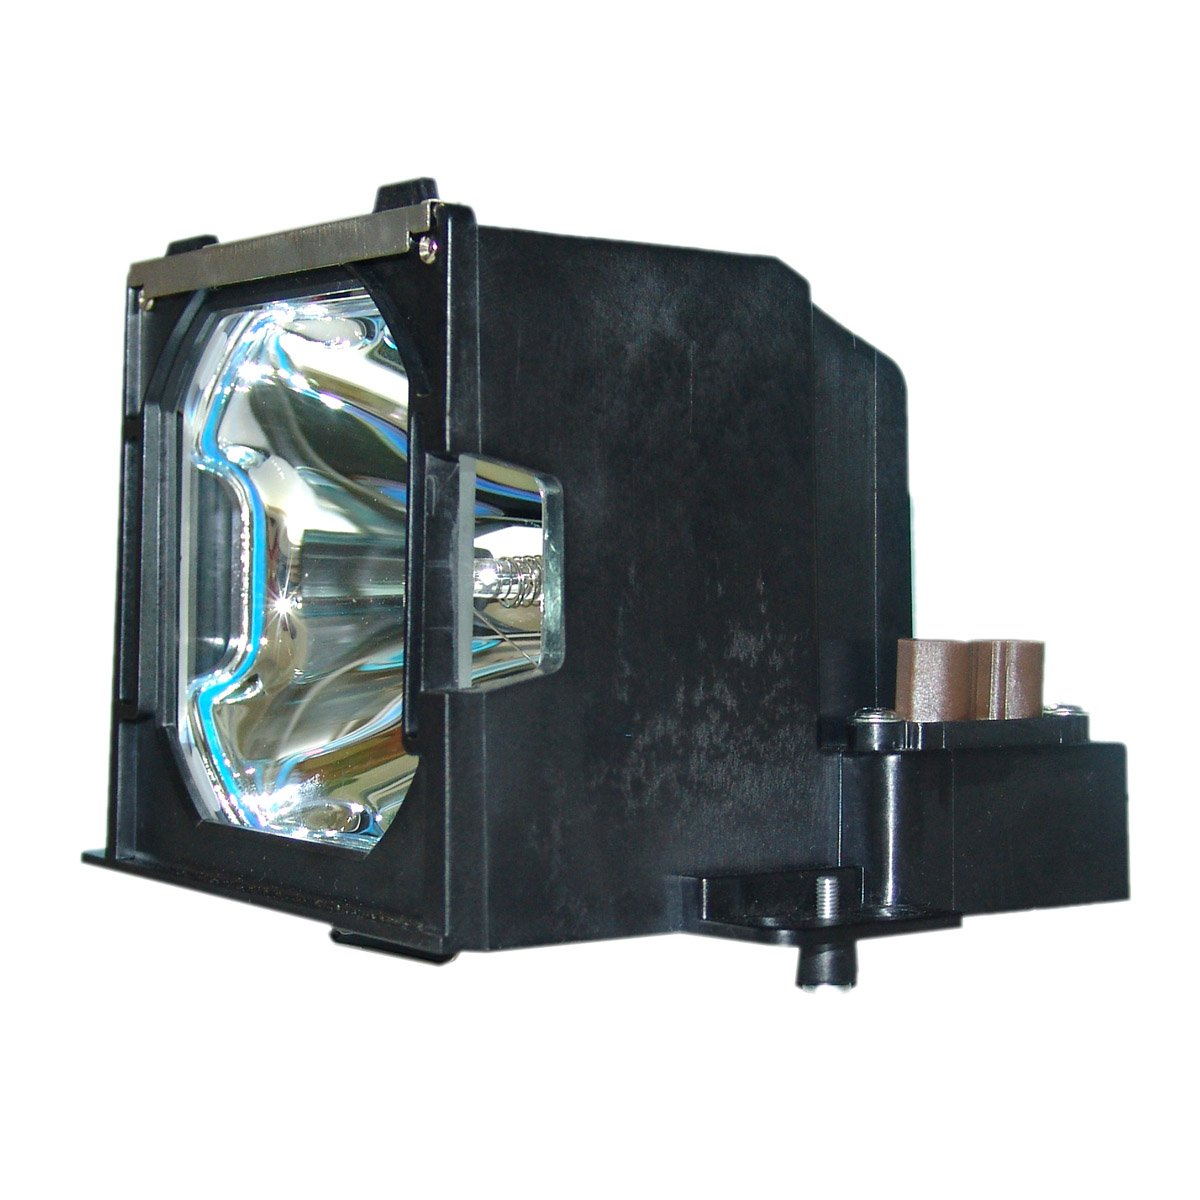 SpArc OEMプロジェクター交換用ランプ 囲い/電球付き Christie LX45用 Platinum (Brighter/Durable) Platinum (Brighter/Durable) Lamp with Housing B07M754DQ5